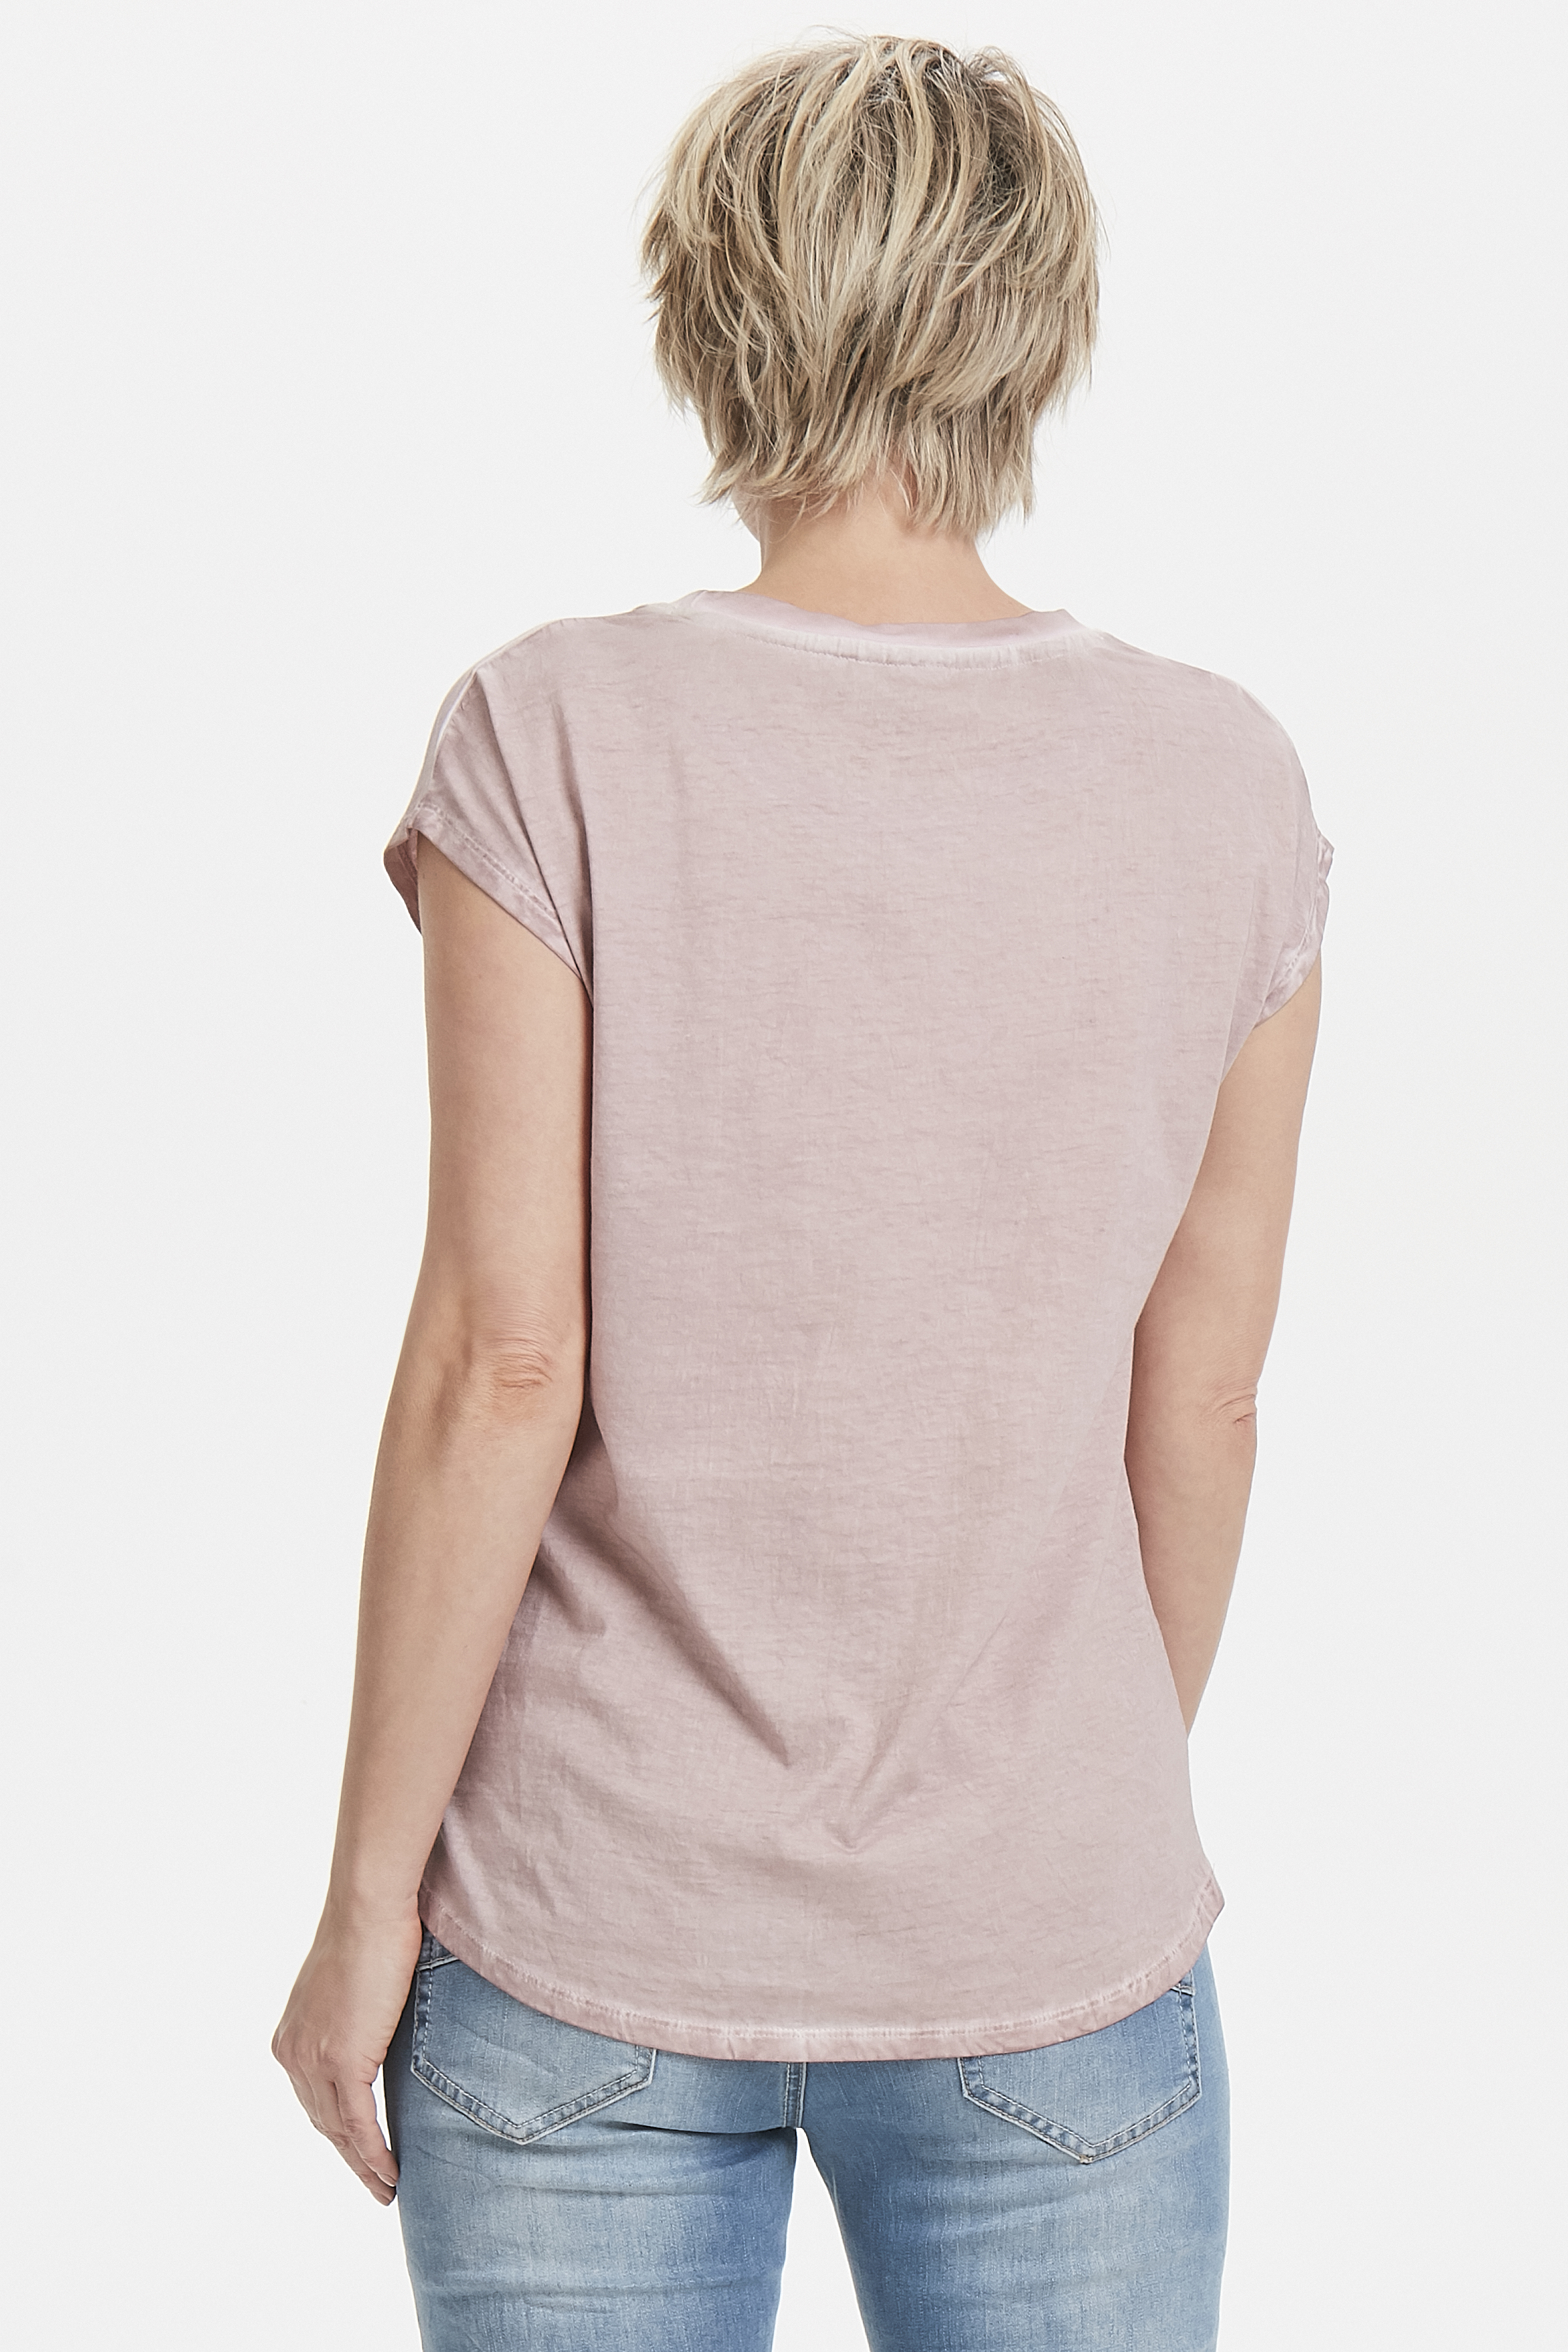 Misty roze Korte mouwen T-shirt  van Bon'A Parte – Door Misty roze Korte mouwen T-shirt  van maat. S-2XL hier